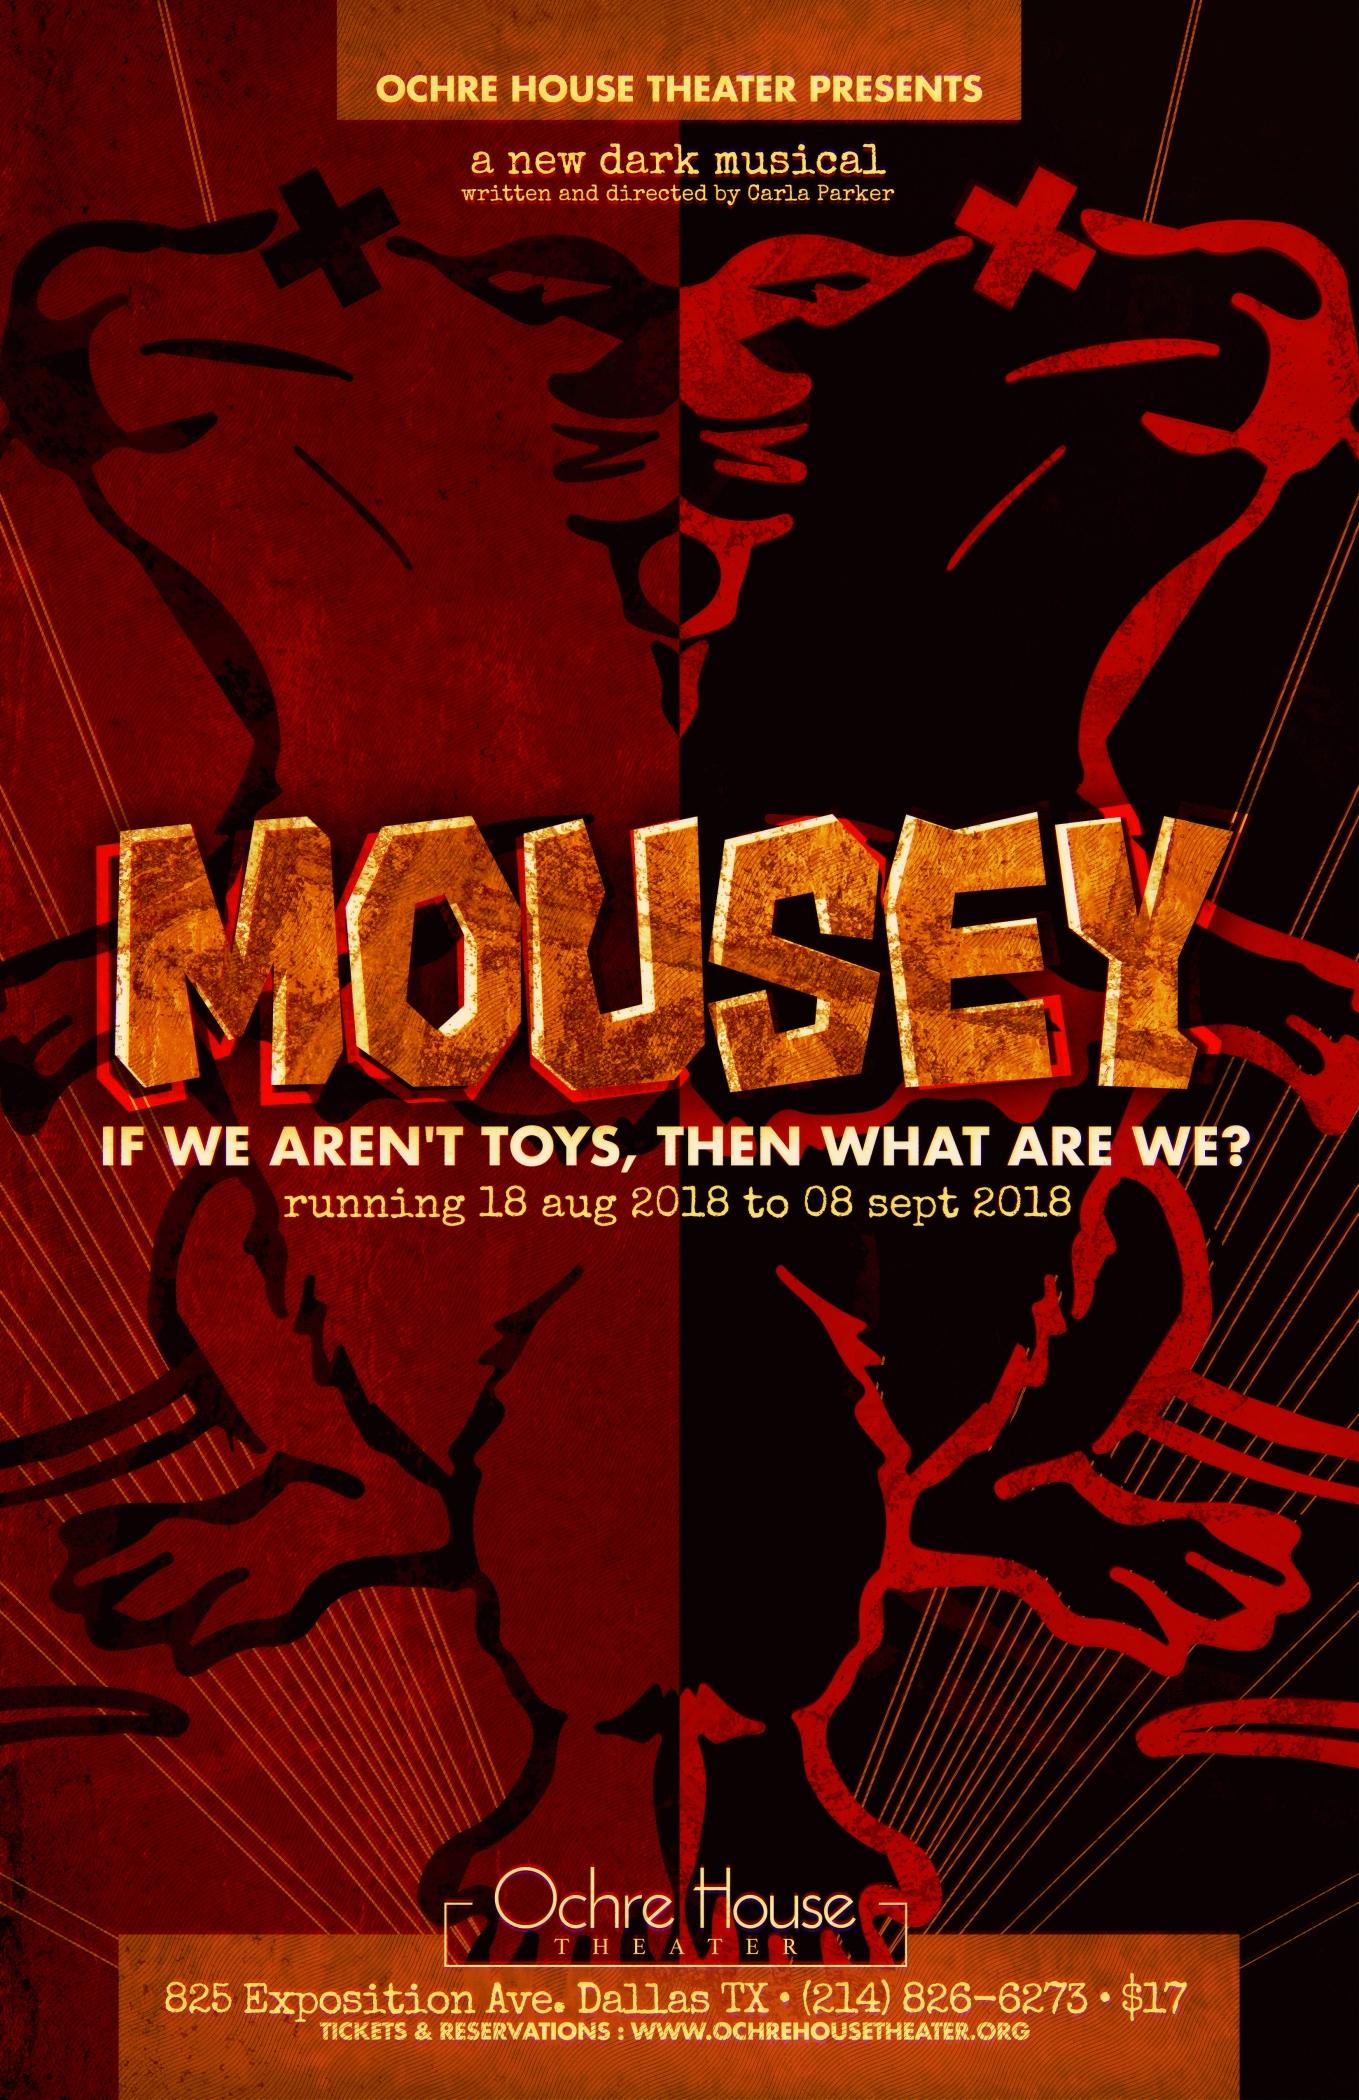 OCHRE_Mousey_v3_web-e1530643912867